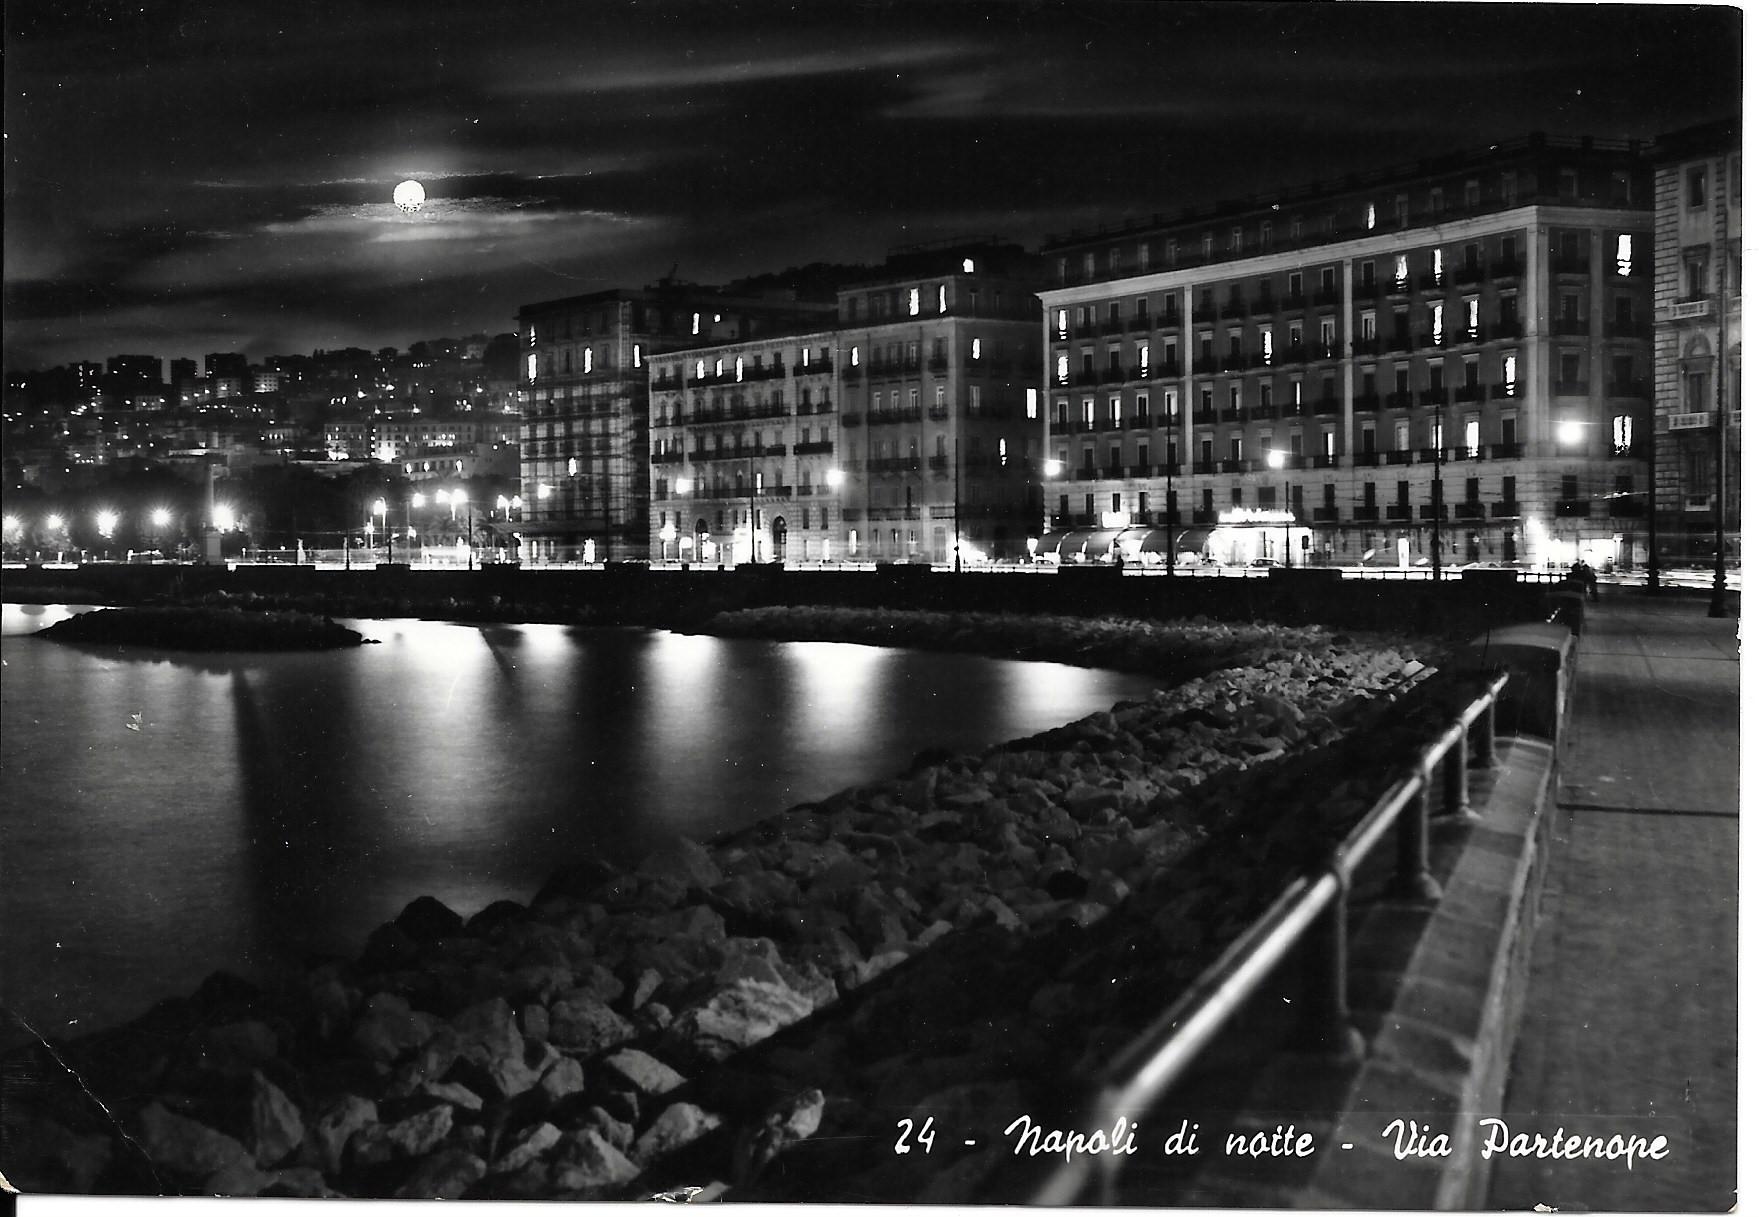 Nathan Never Libreria Peterpan Napoli Di Notte Via Partenope V1959